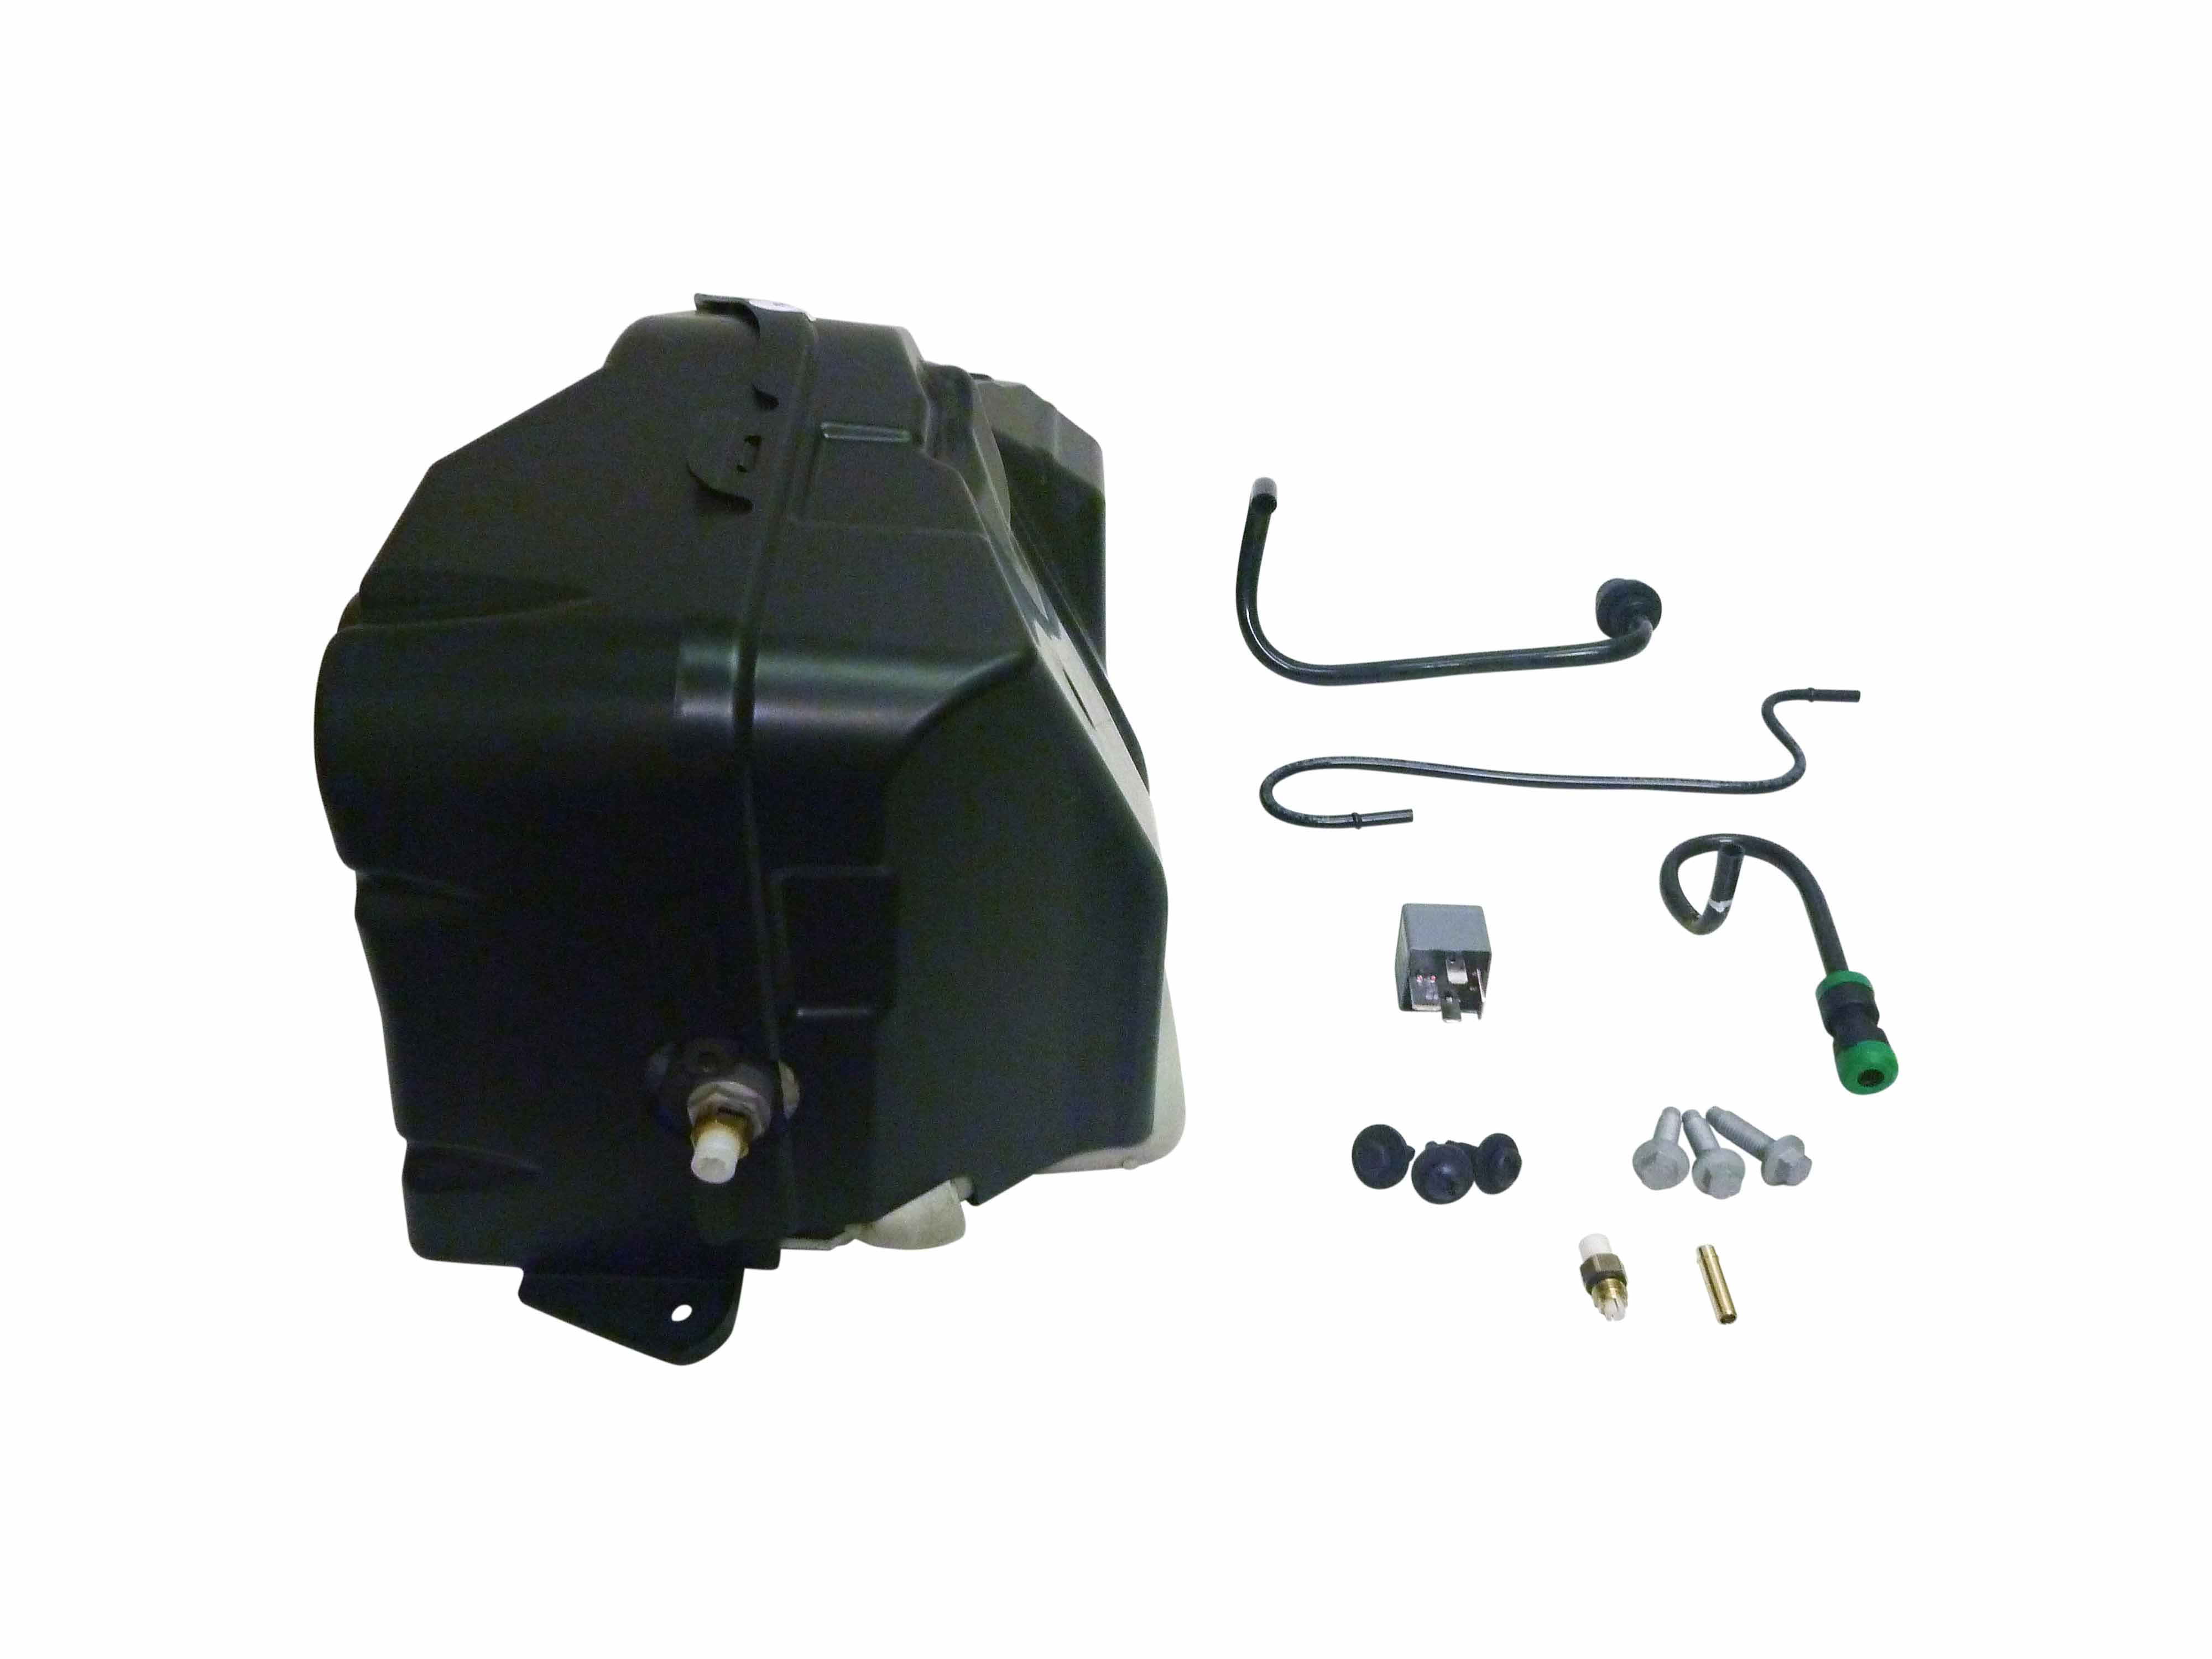 cap air land landrover suspension dryer hitachi view compressor rover